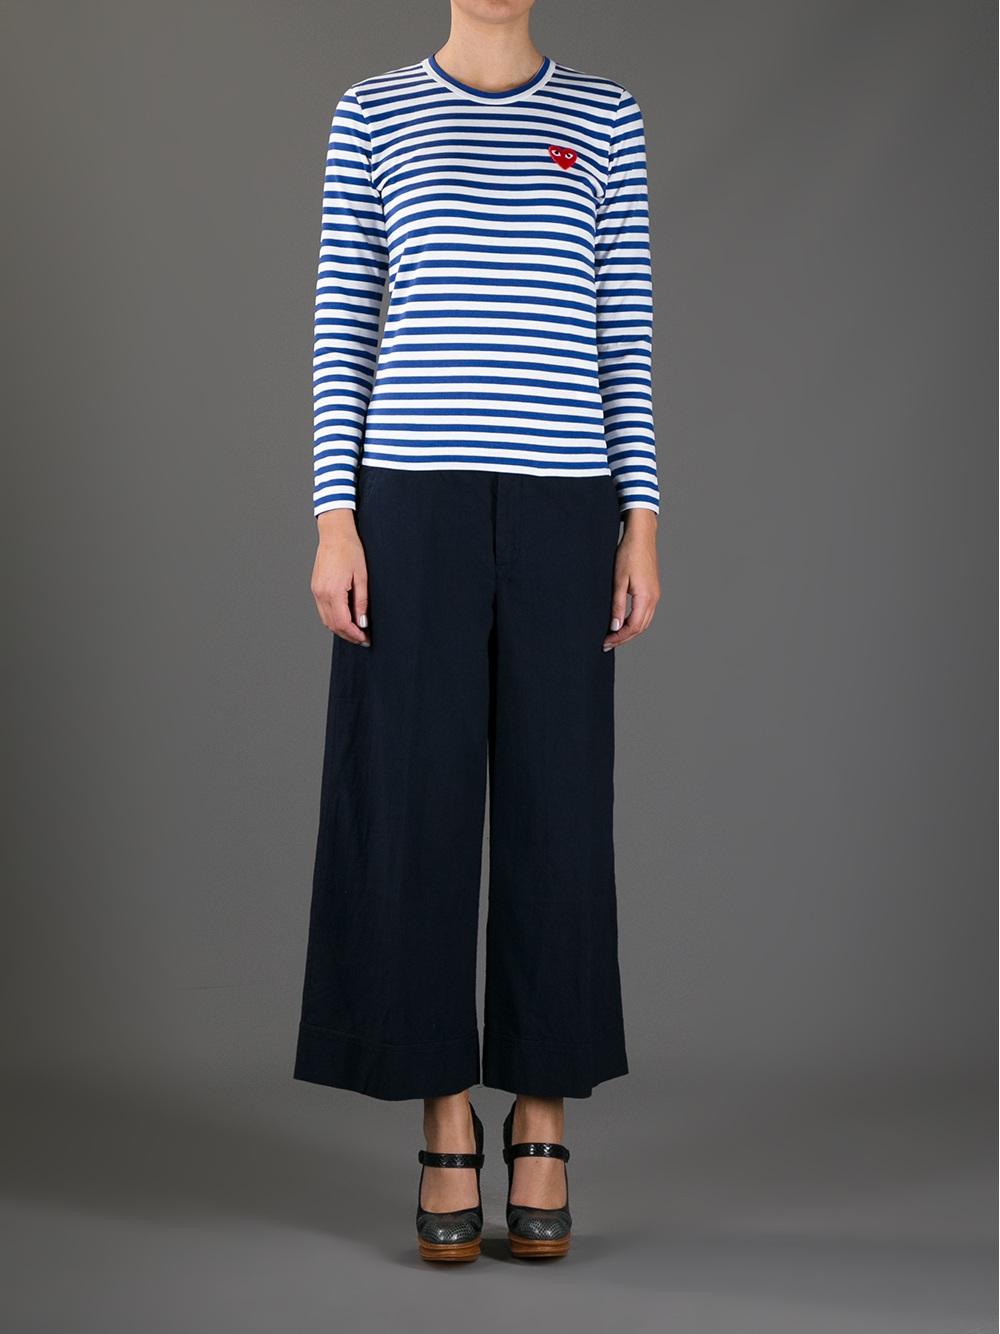 Lyst - Comme des Garçons Long Sleeve Striped Tshirt in Blue 82c44c69a